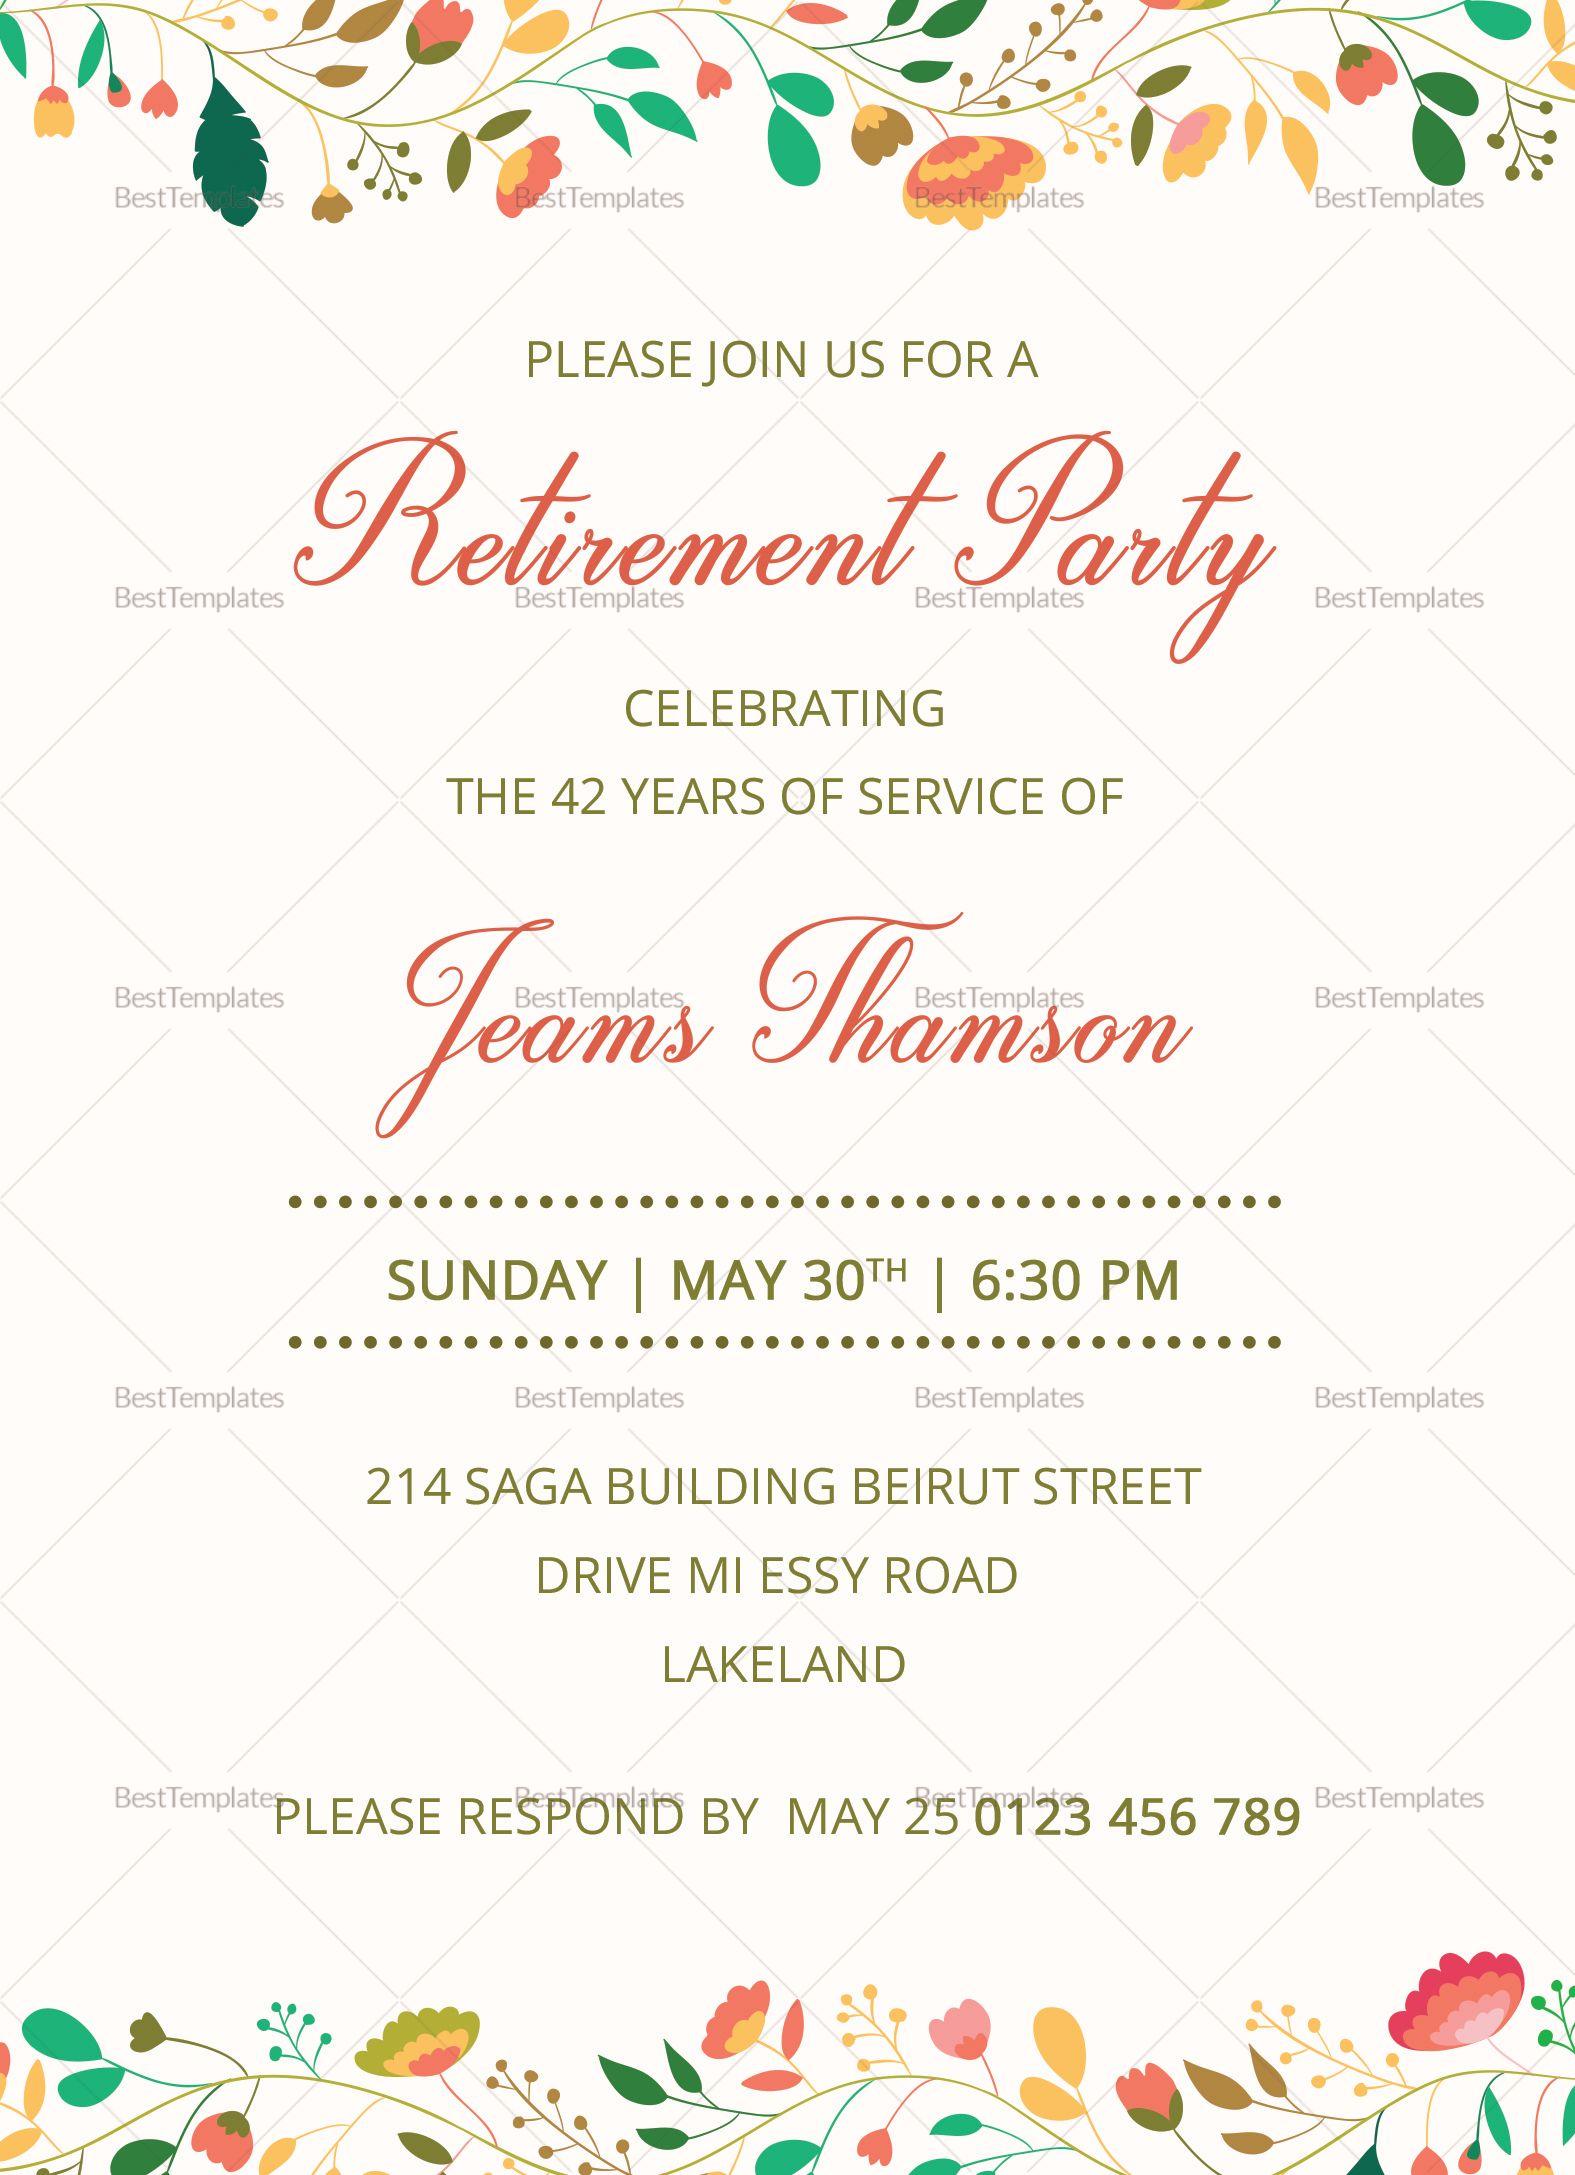 Corporate Retirement Party Invitation Template Retirement Invitation Card Retirement Invitation Template Party Invite Template